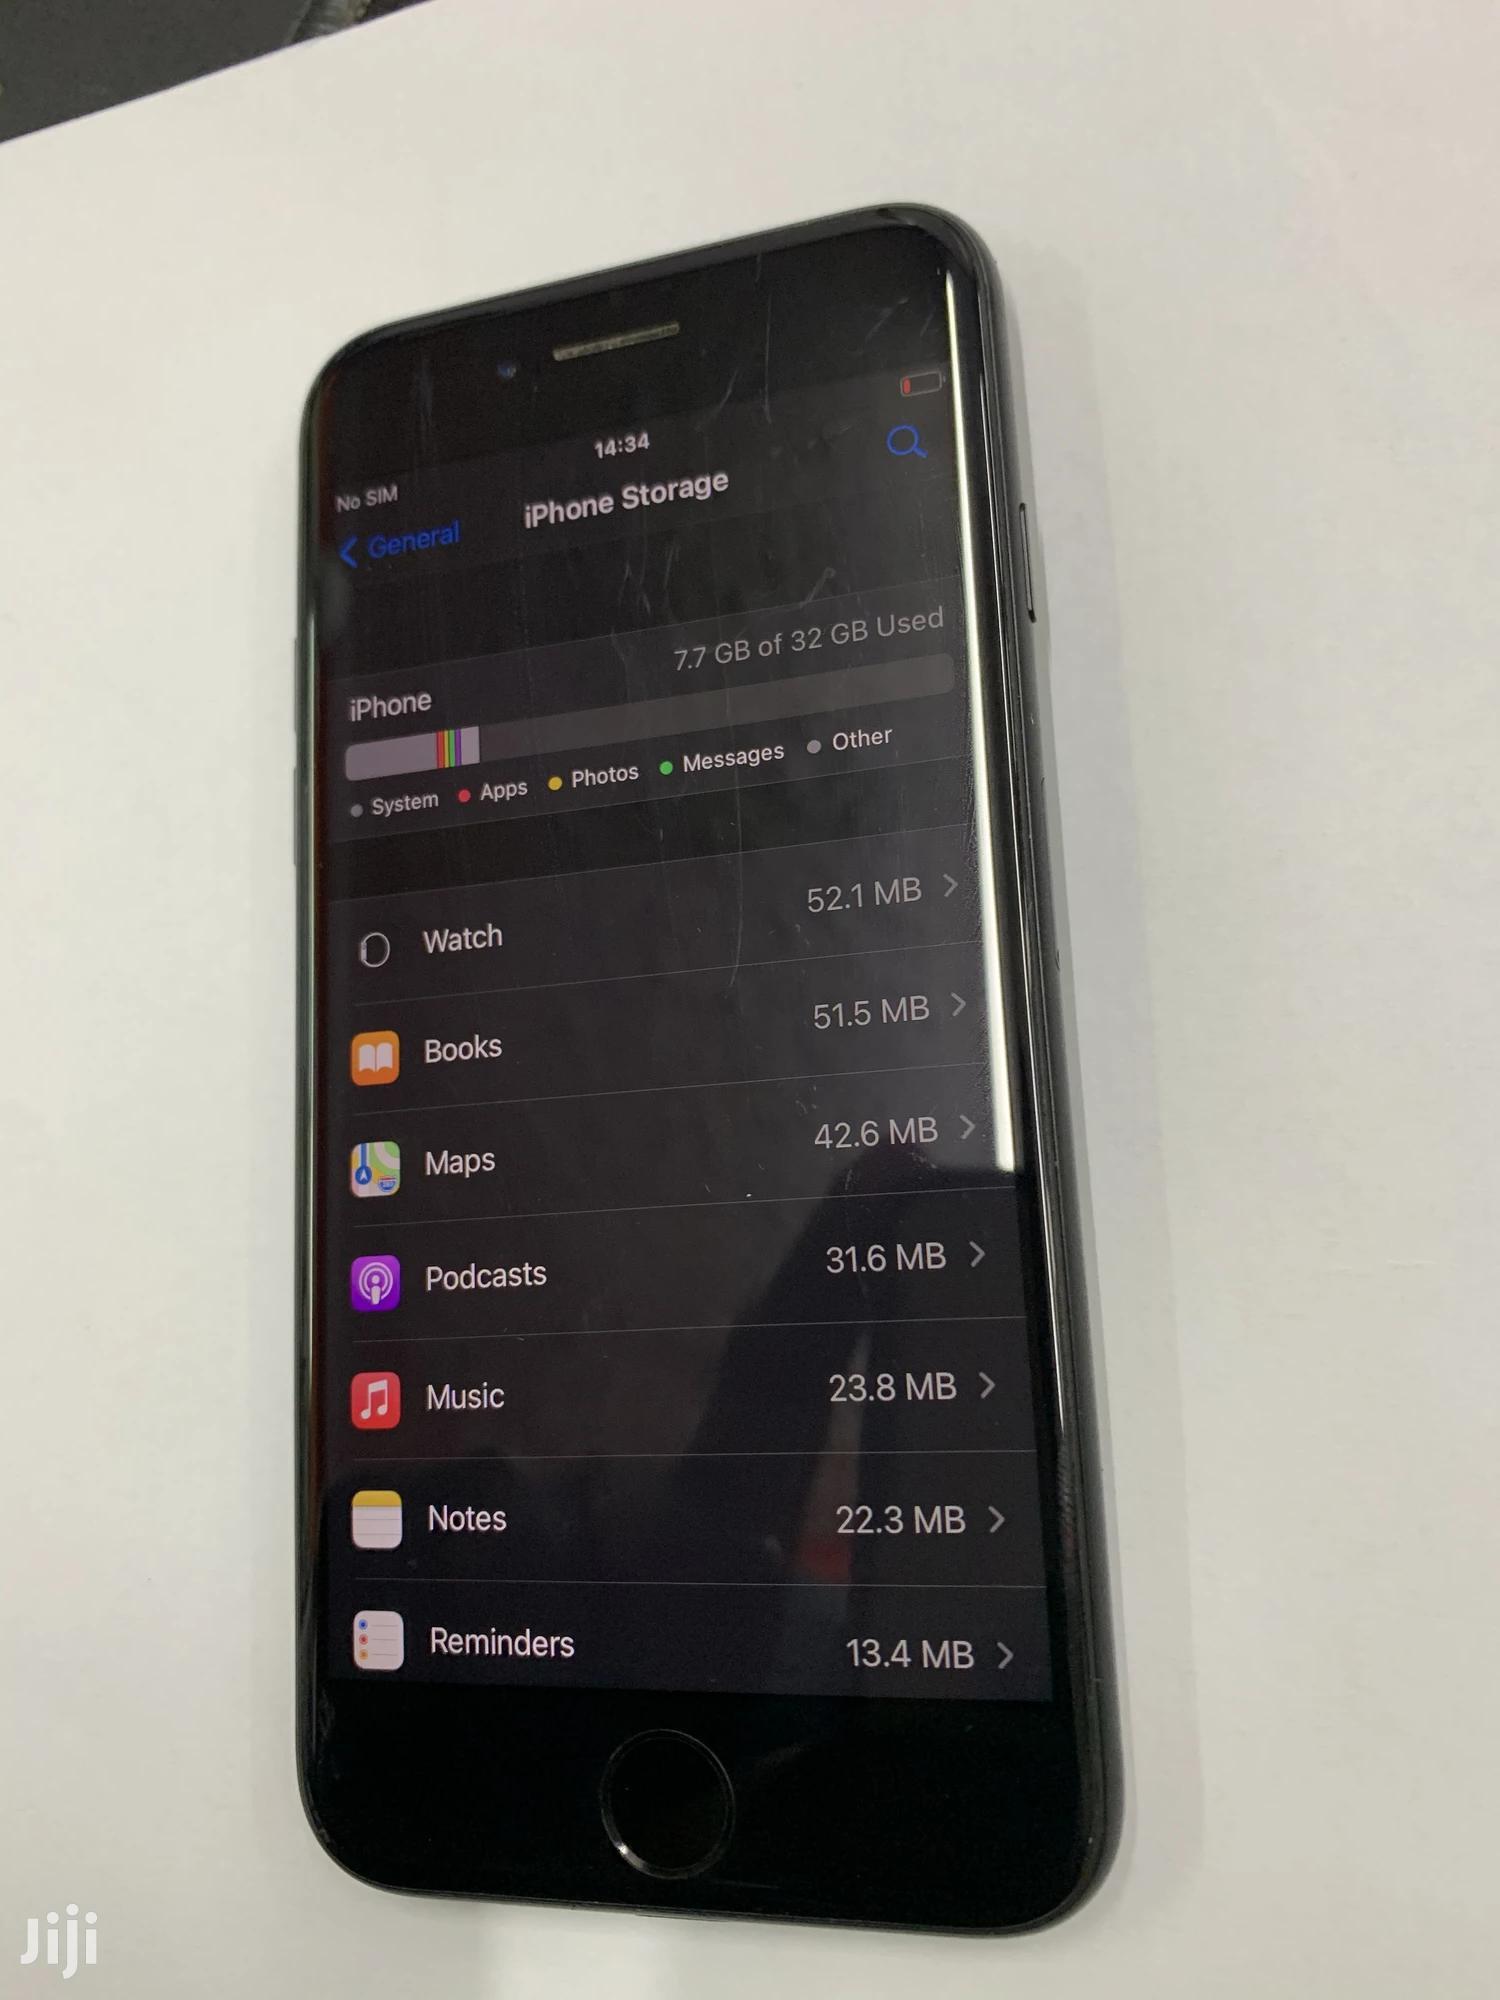 Apple iPhone 7 32 GB Black | Mobile Phones for sale in Nairobi Central, Nairobi, Kenya